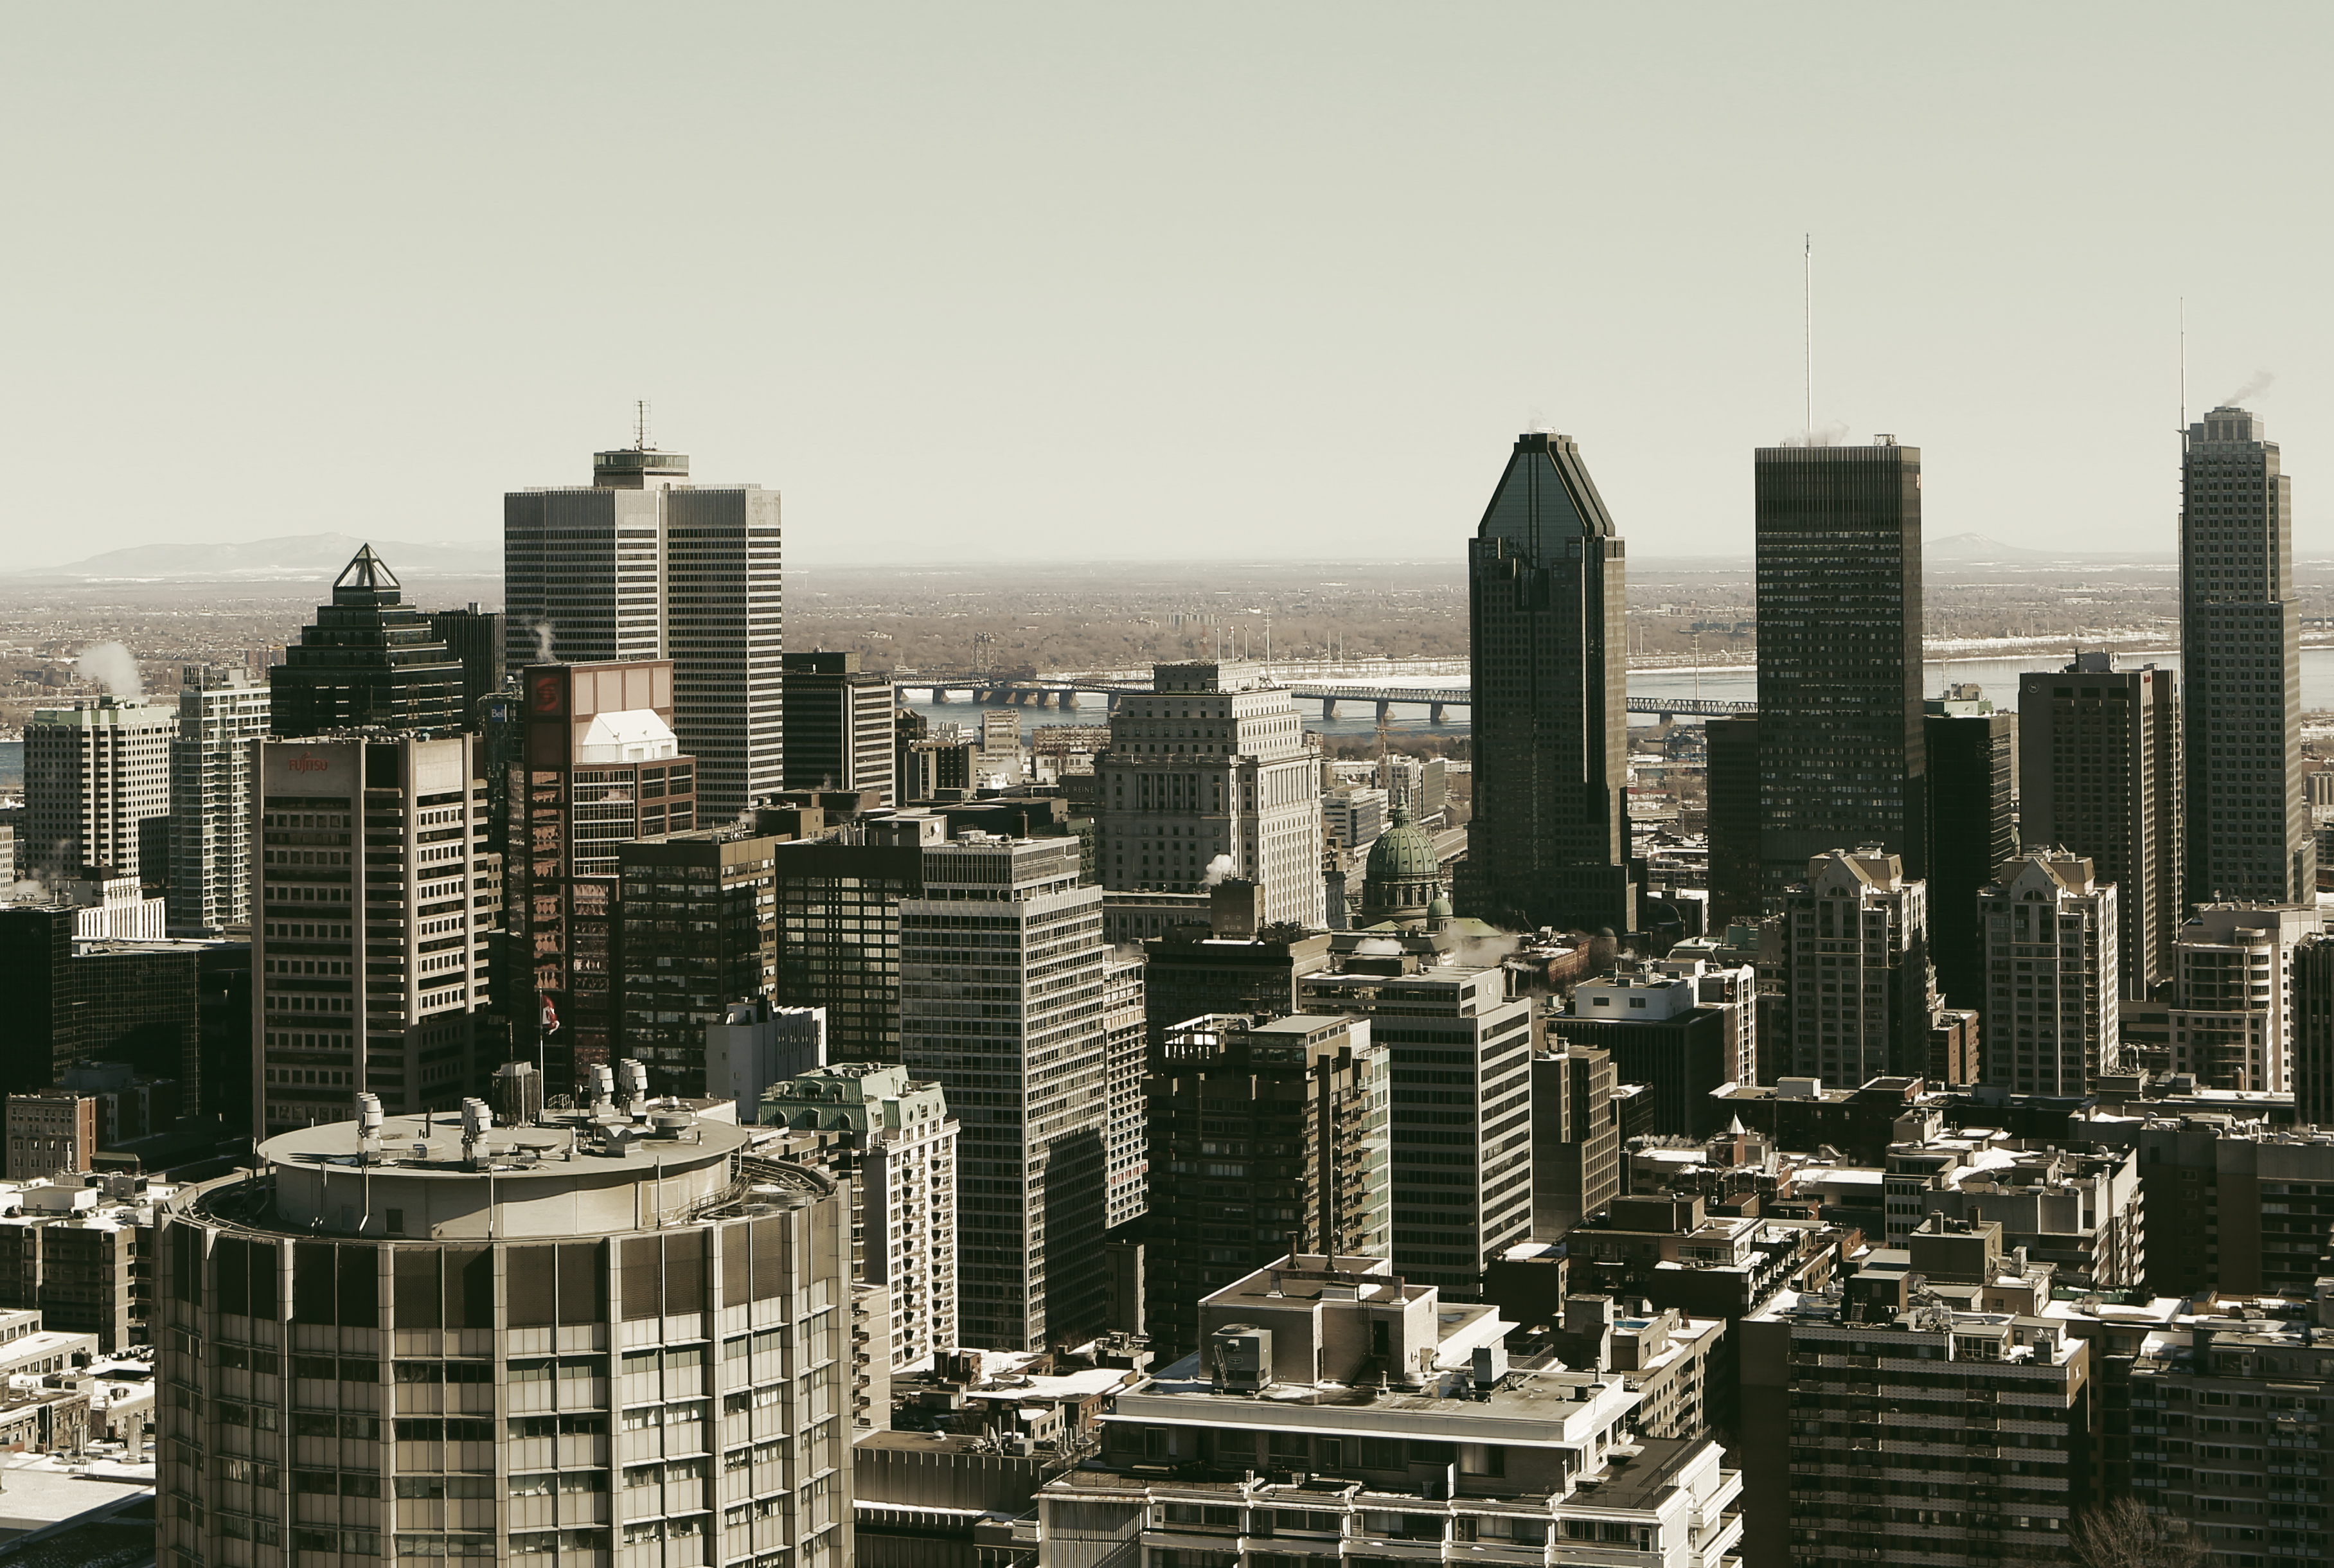 2014-05-Life-of-Pix-free-stock-photo-city-Montreal-skyline.jpg